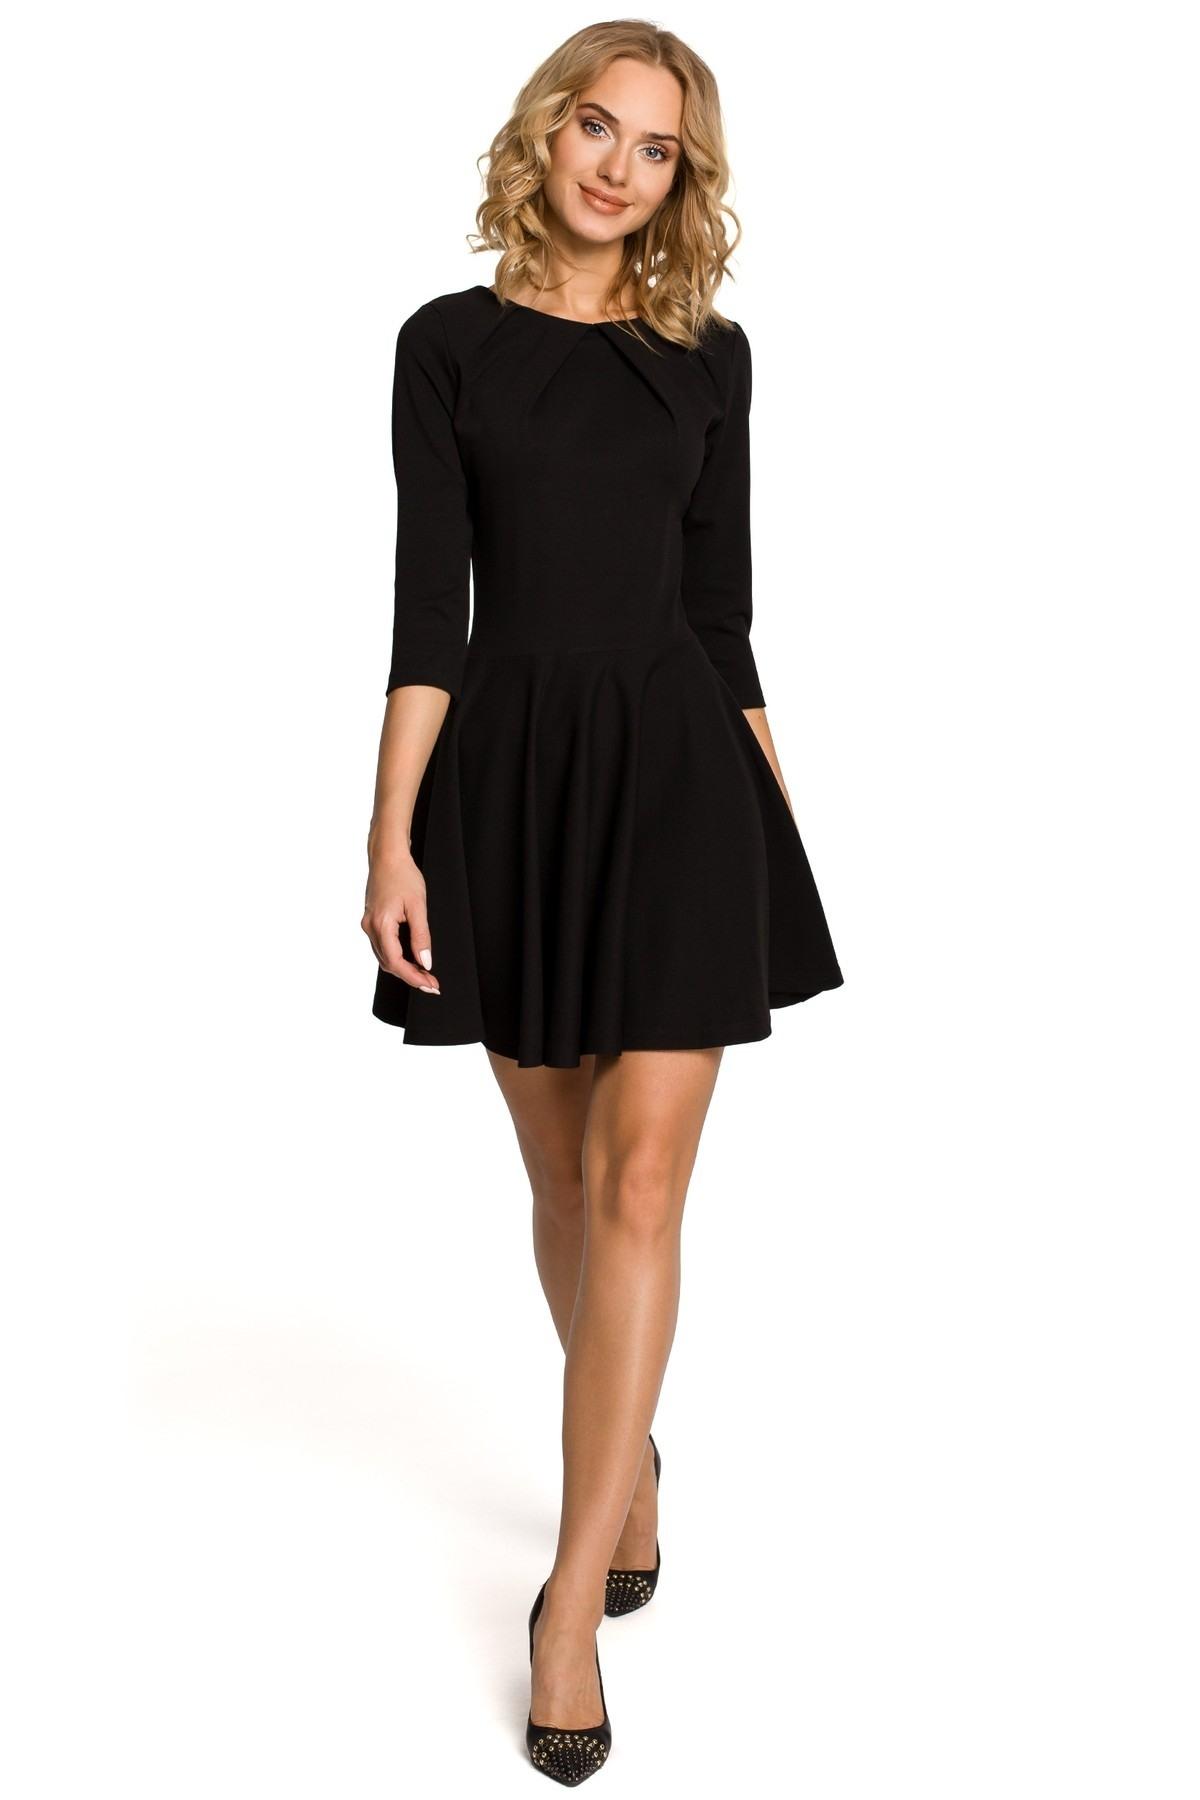 Designer Kreativ Elegantes Kleid Mit Ärmel Ärmel15 Schön Elegantes Kleid Mit Ärmel Boutique